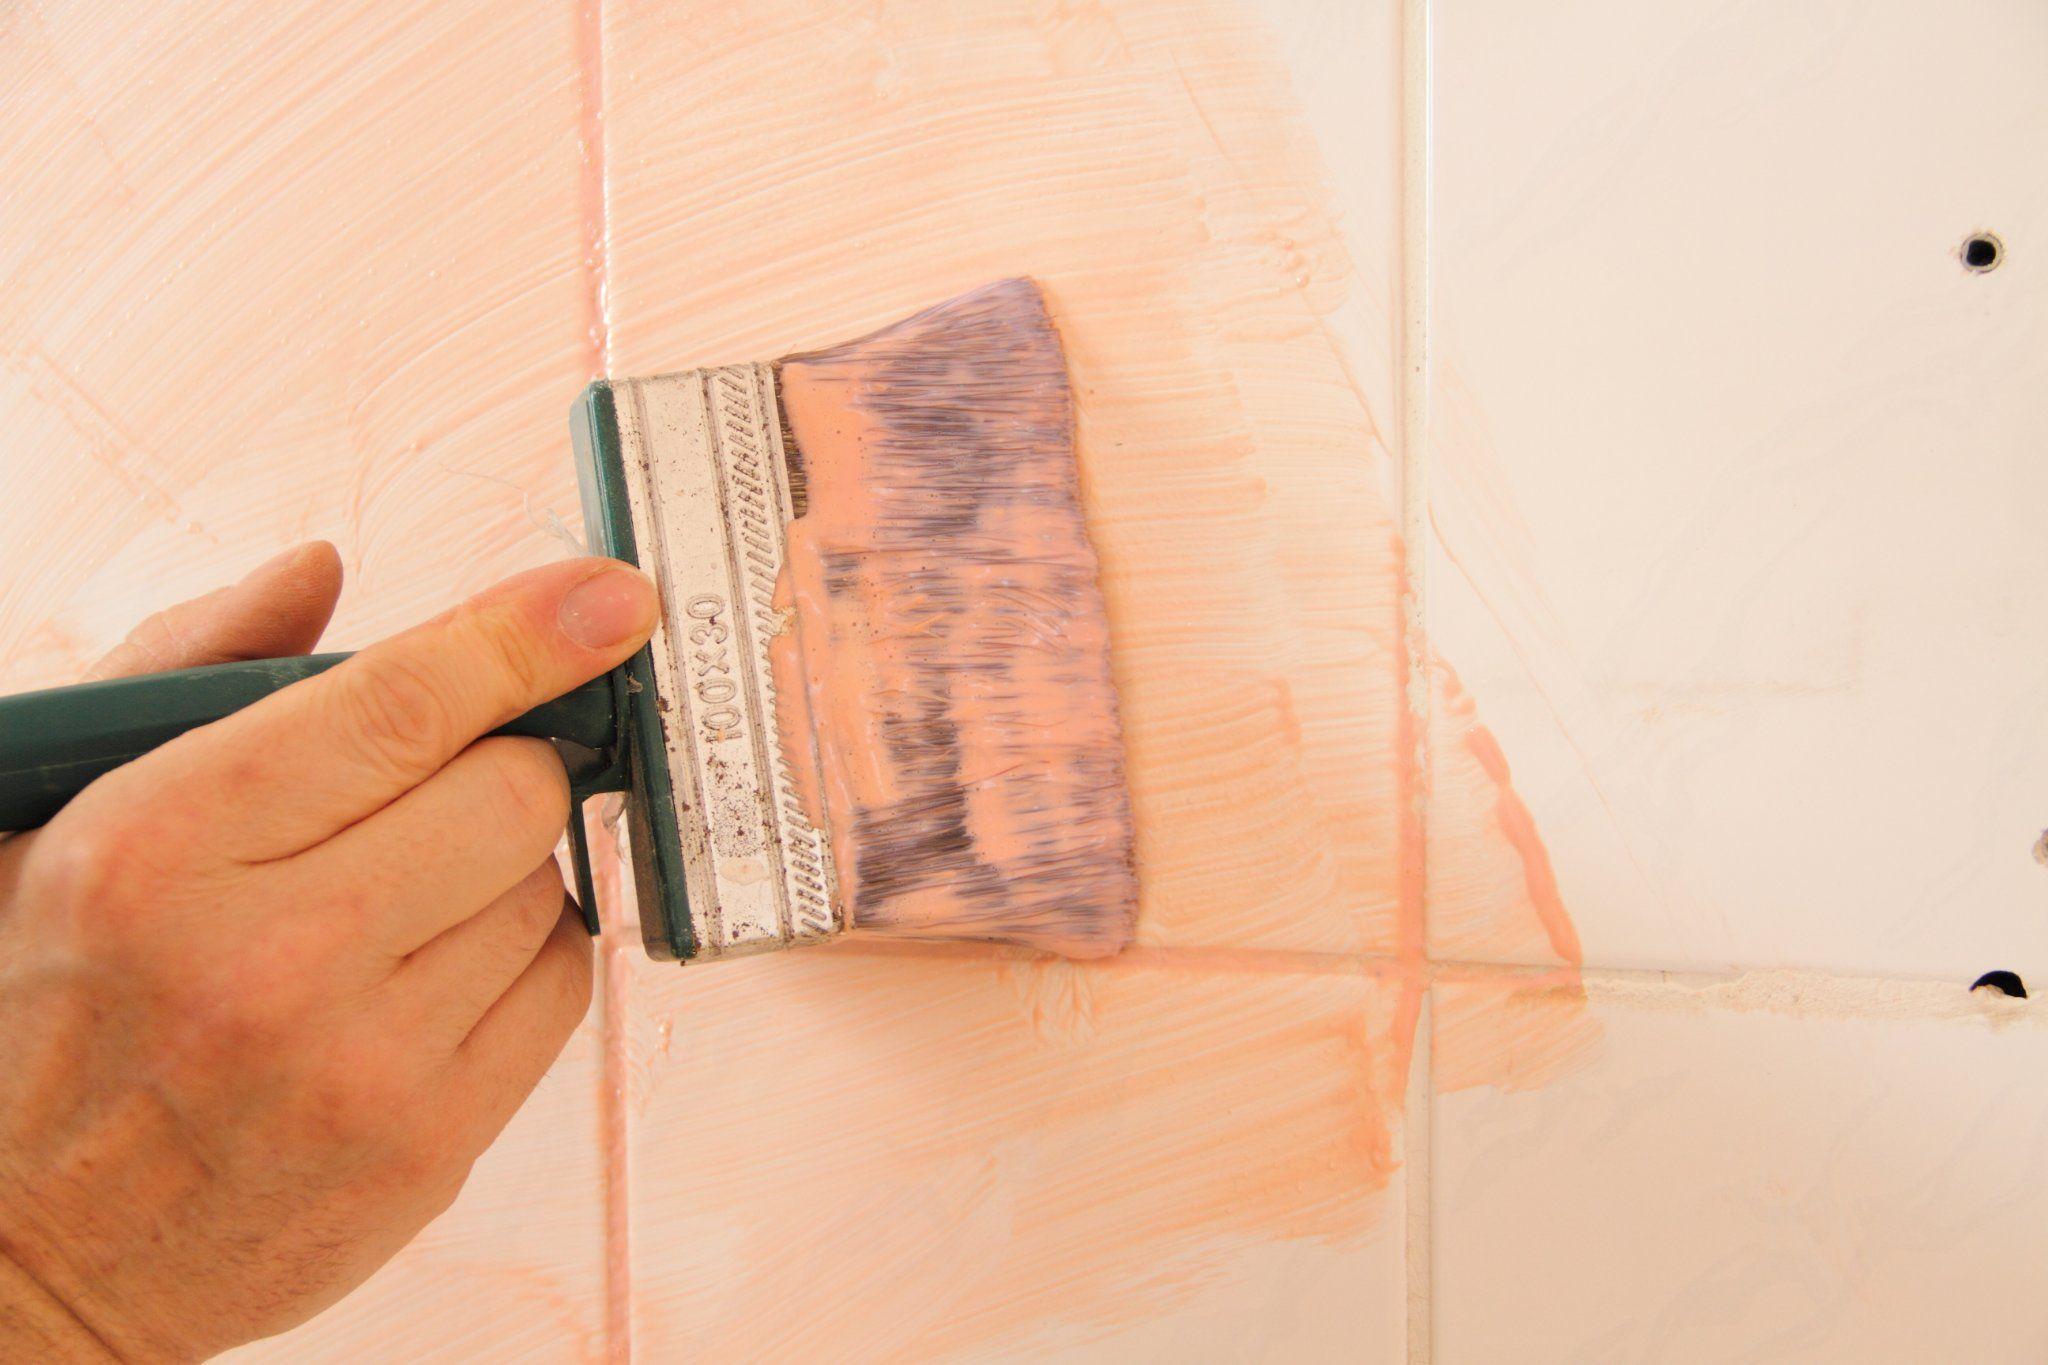 dipingere le piastrelle